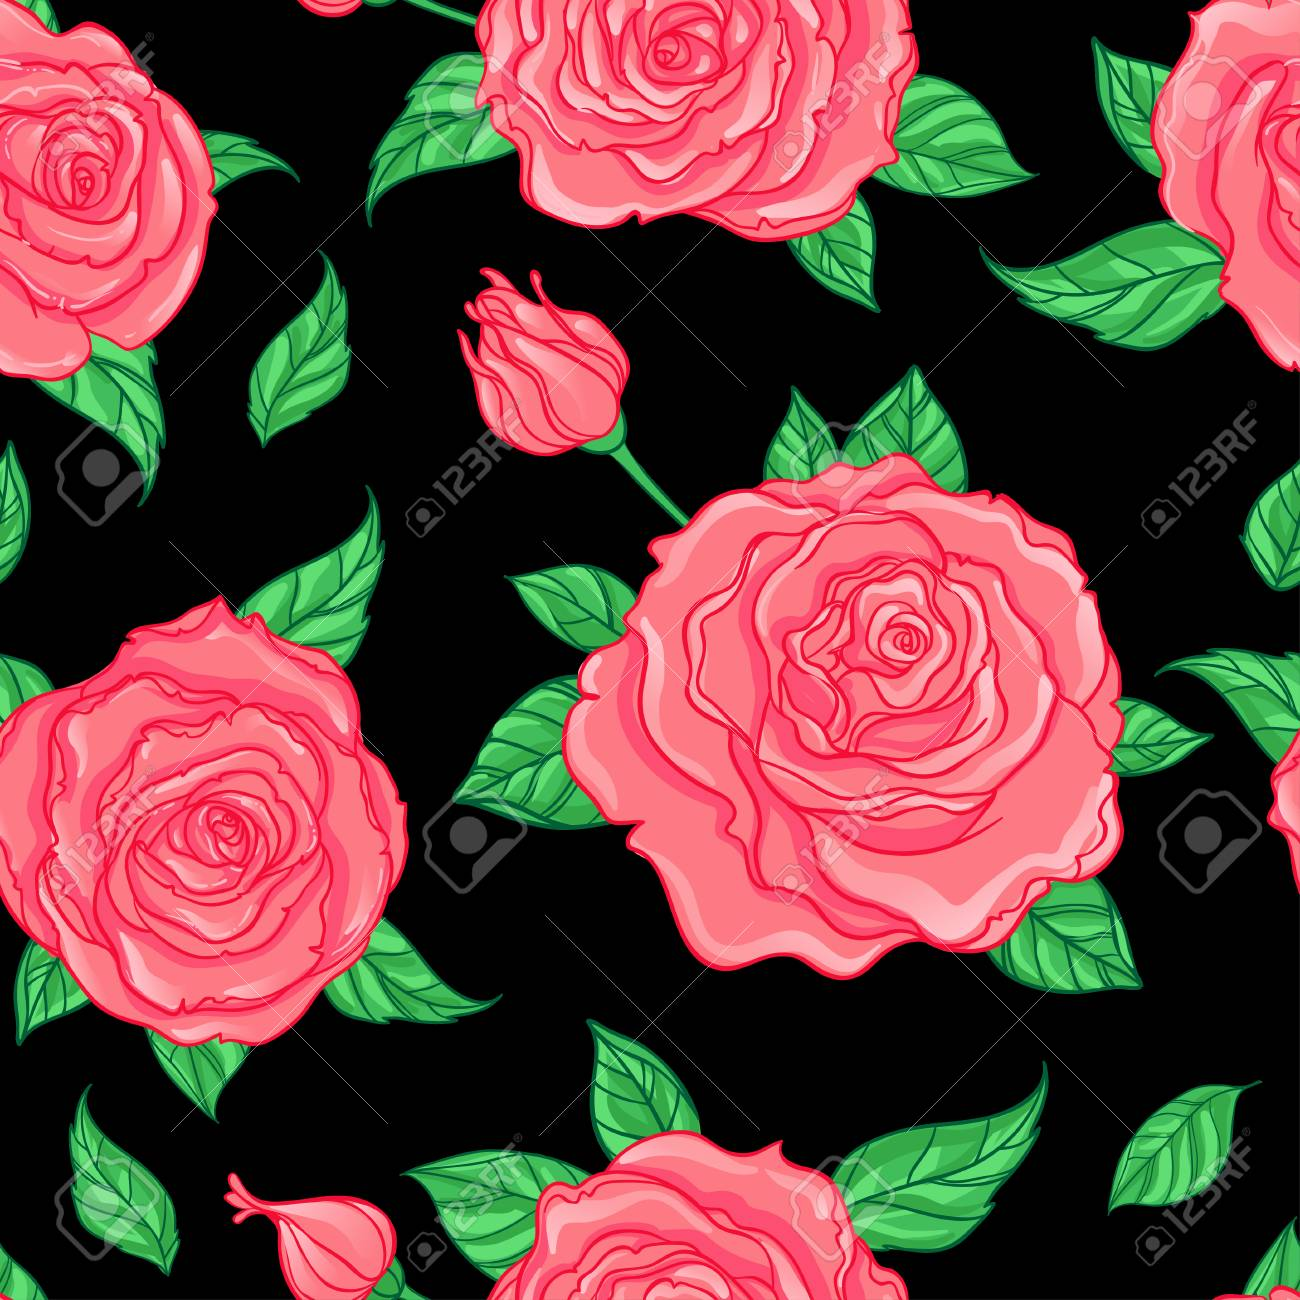 Red Roses Over White Background Seamless Elegant Vintage Floral Pattern Design For Fabric